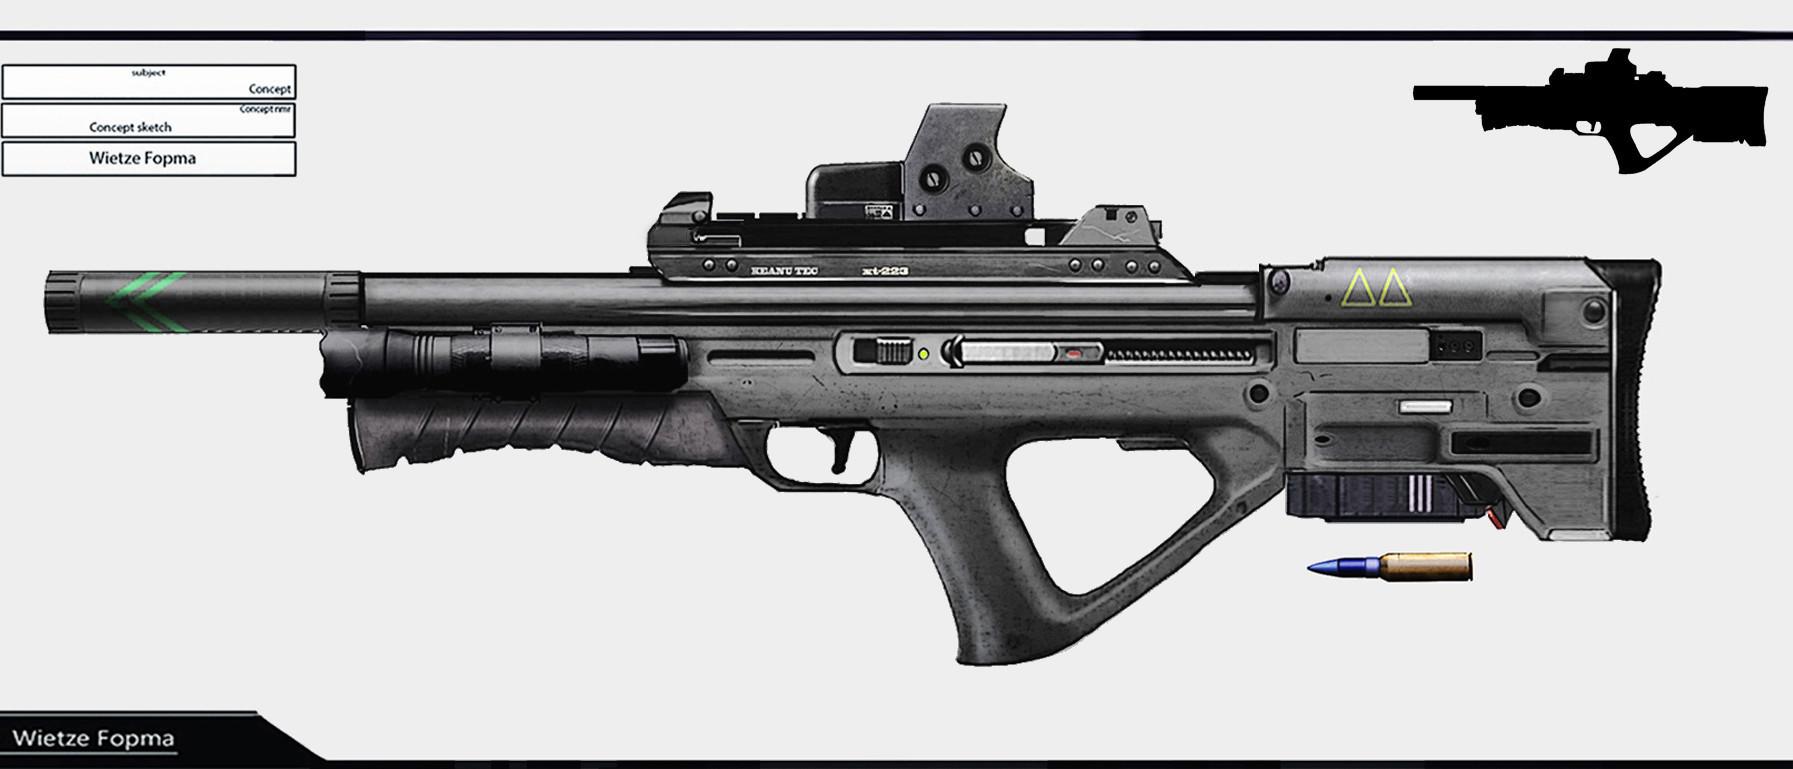 Wietze fopma bullpup rifle